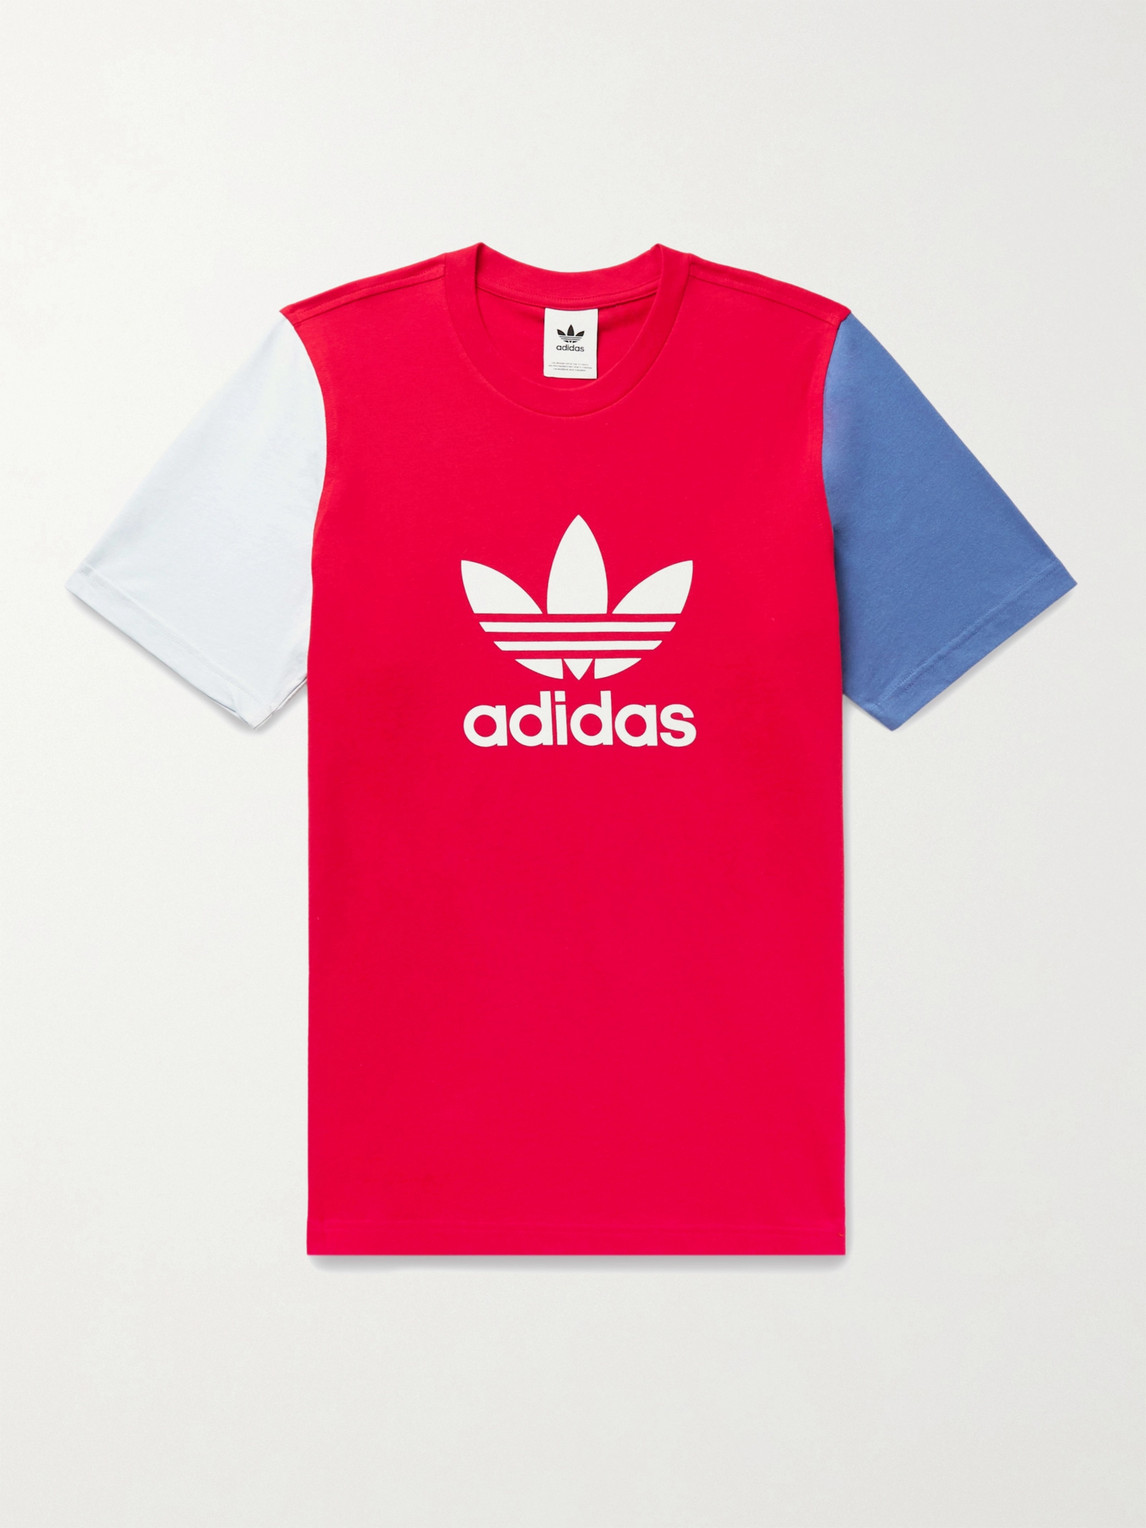 Adidas Originals COLOR-BLOCK LOGO-PRINT COTTON-JERSEY T-SHIRT